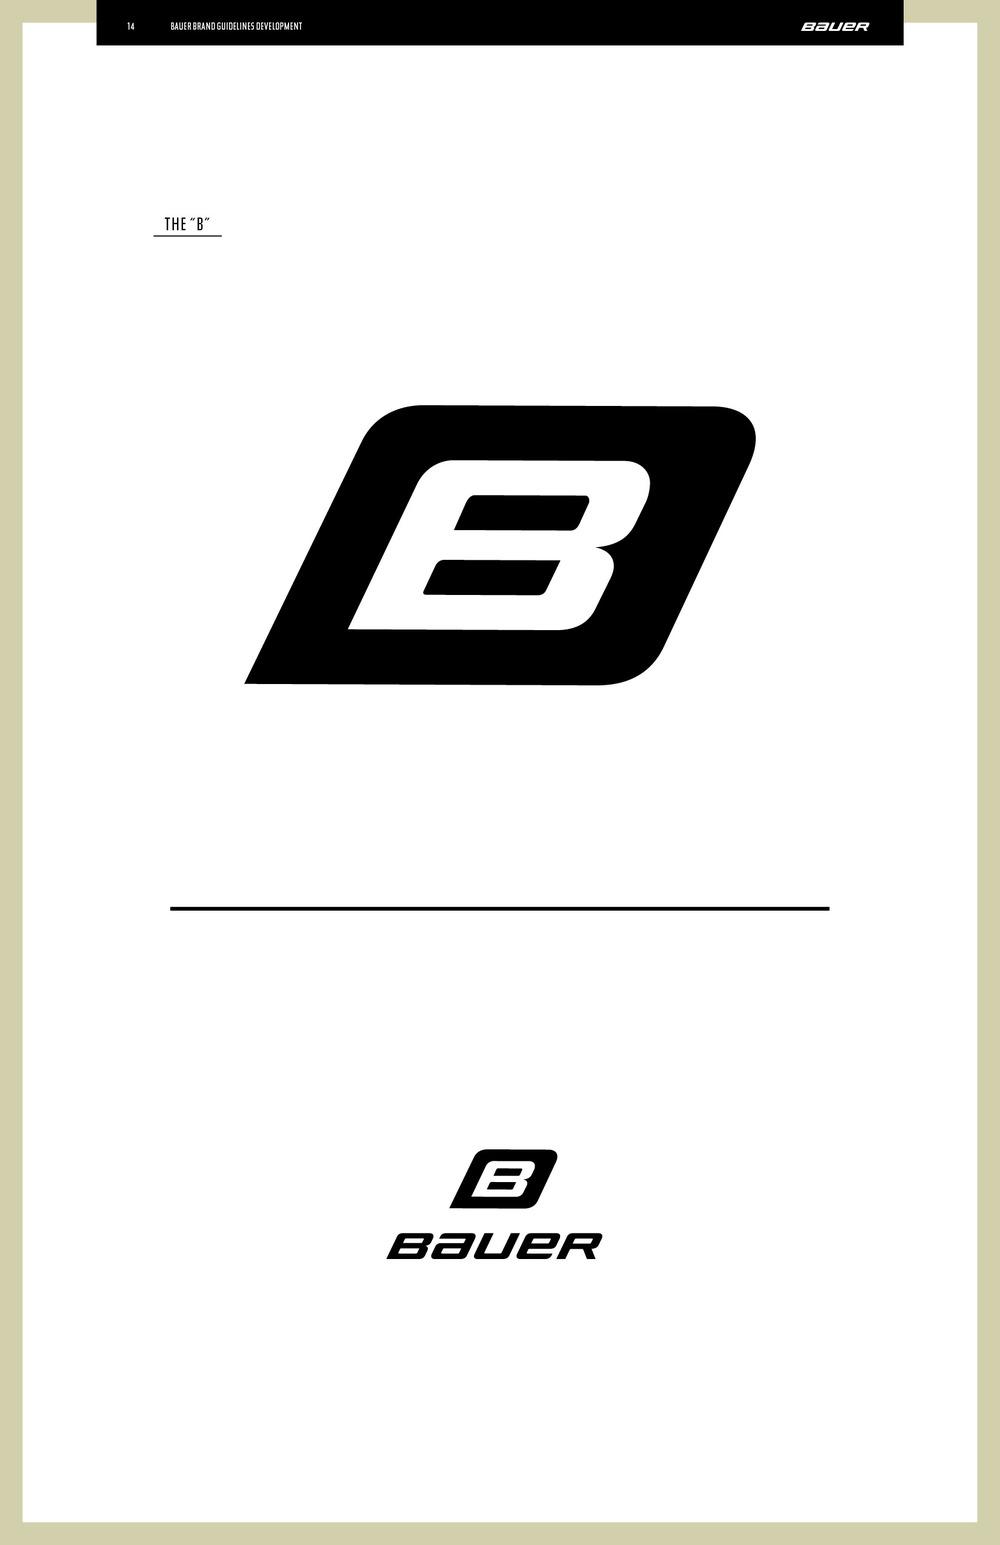 bauer_toolkit14.jpg